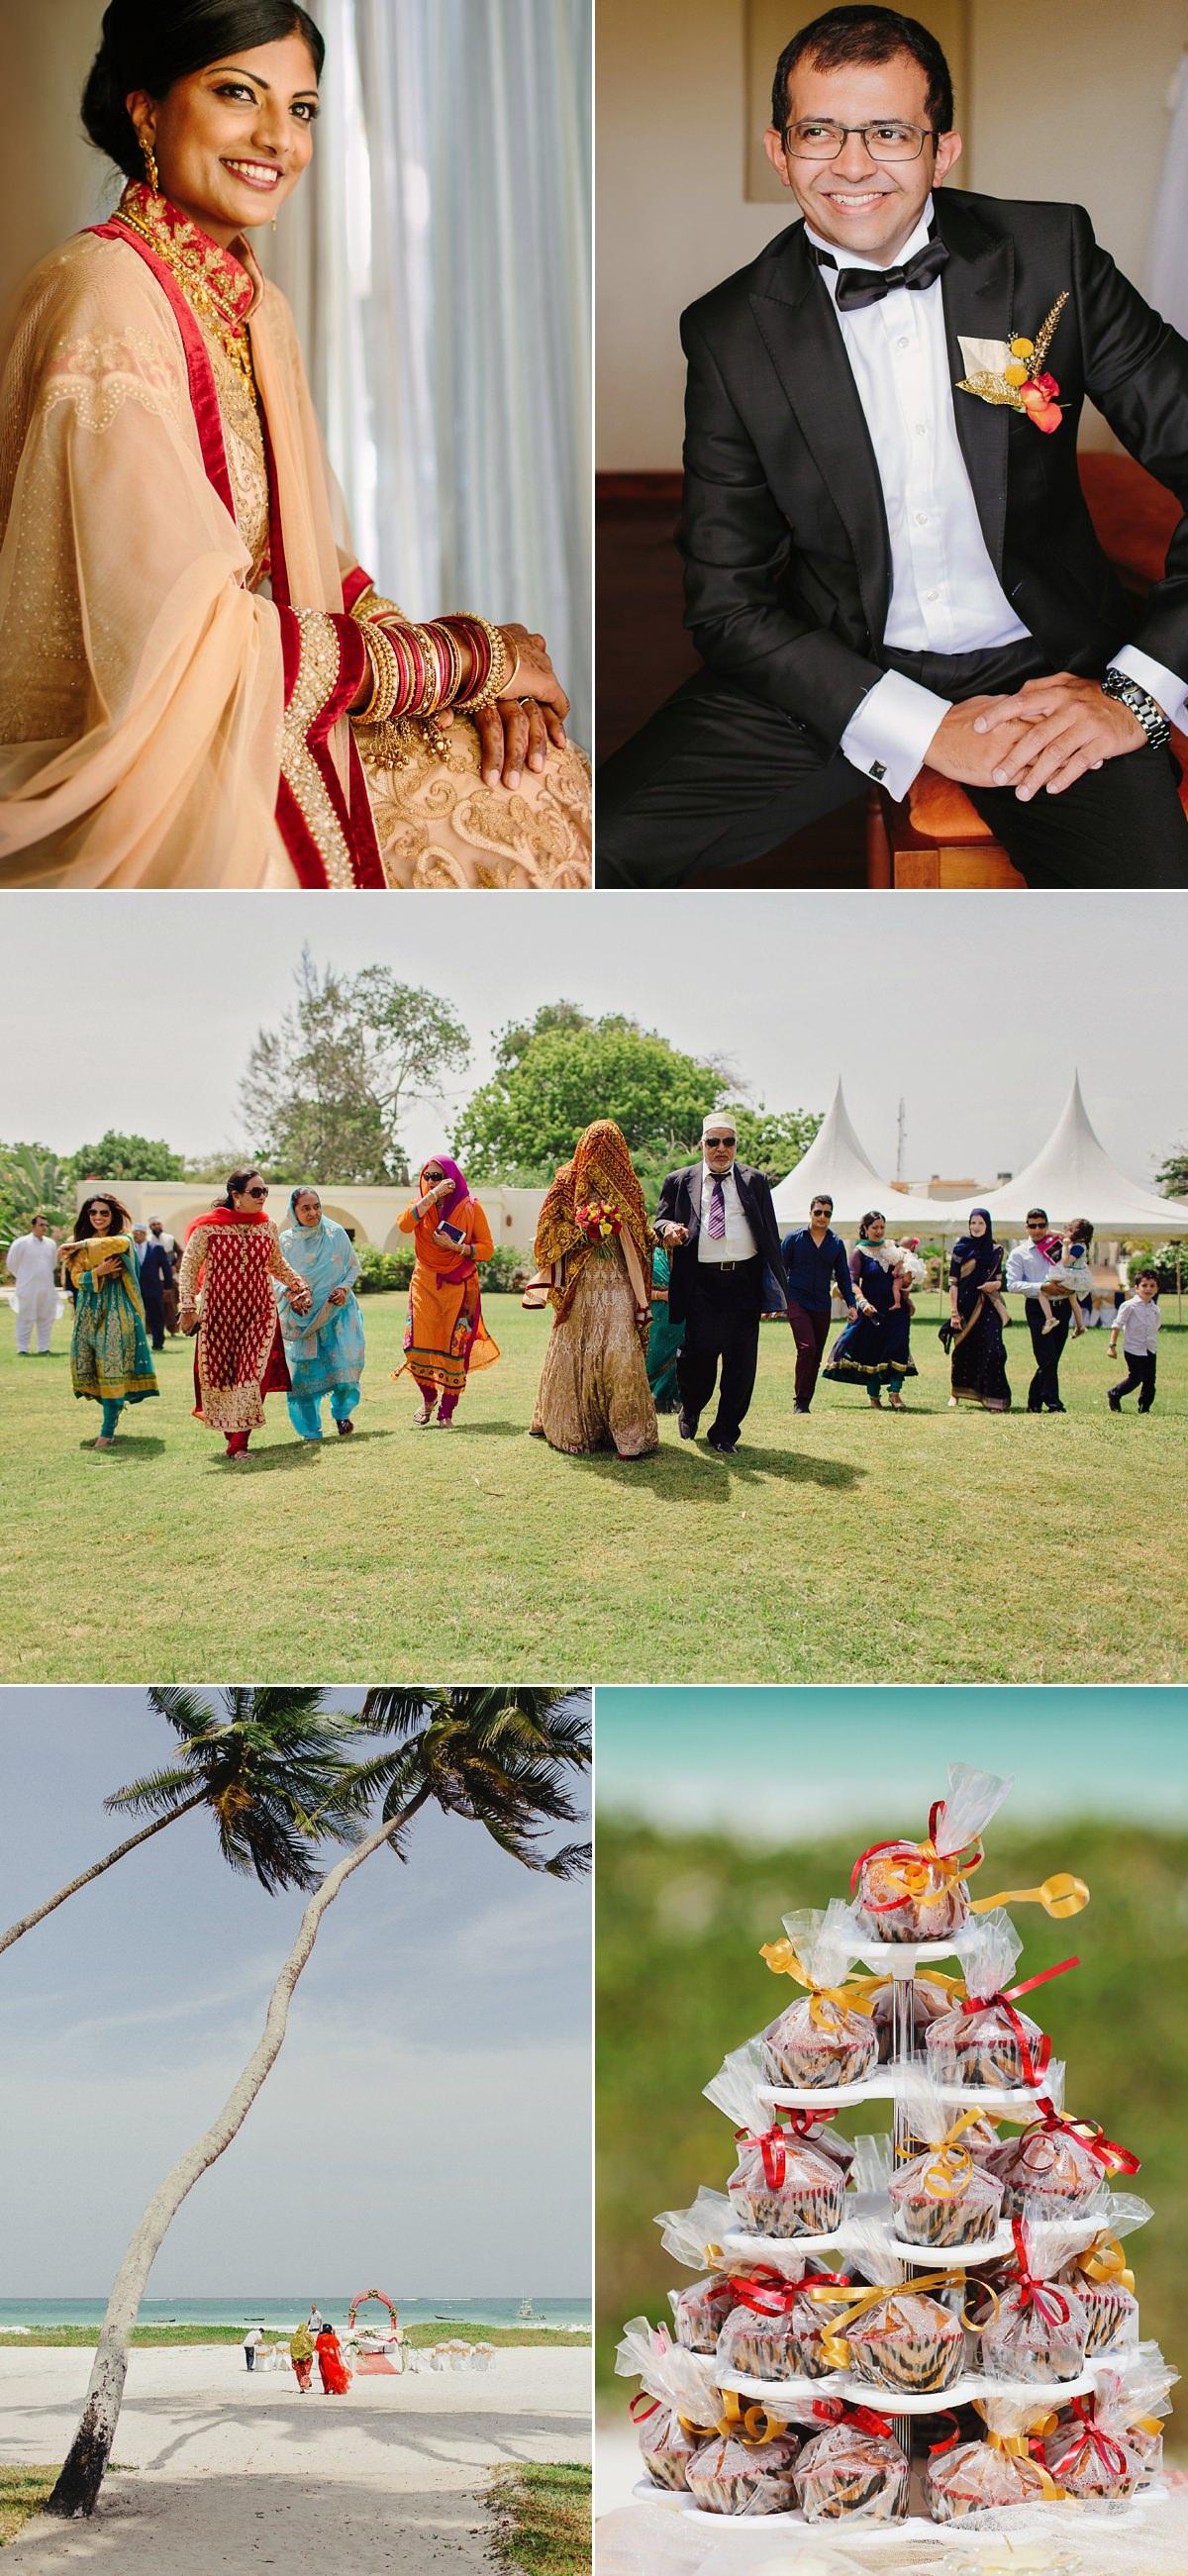 Kenya weddings, Kenyan weddings, Wedding in Kenya, Kenya wedding, Kenyan wedding, Kenyan wedding dresses, professional photographers Kenya, Kenyan wedding photos, Kenya wedding pictures, top Kenyan blogs, weddings in Nairobi, weddings in Mombasa, weddings in Diani, weddings in Malindi, weddings in Naivasha, weddings in Watamu, Top Kenyan Wedding Photographer, Muslim Wedding photographer, Kenyan Muslim weddings,